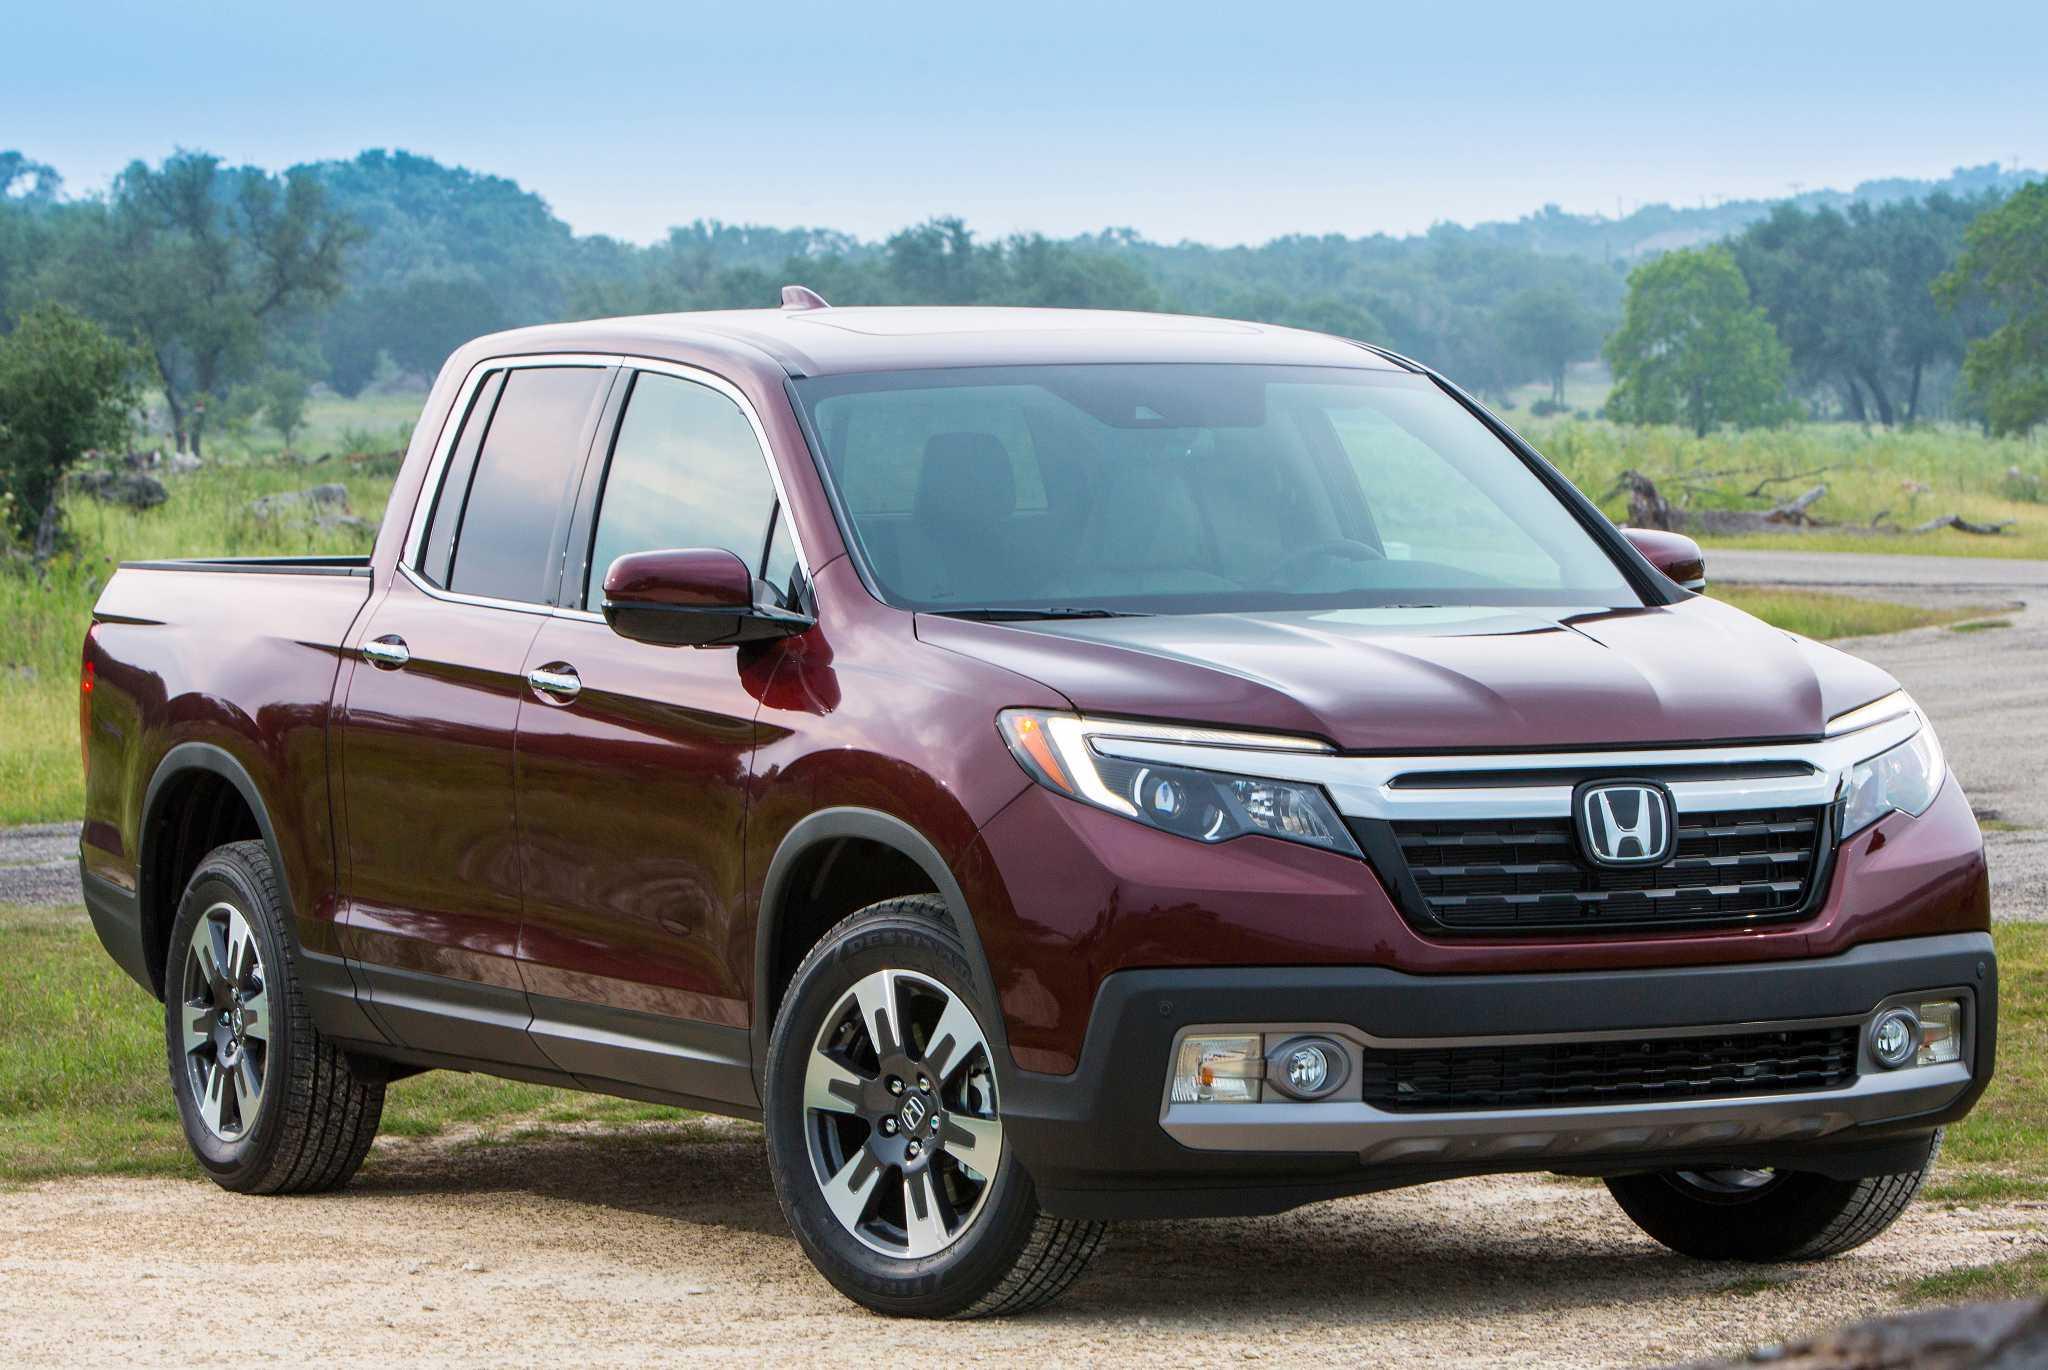 Honda reintroduces the Ridgeline pickup for 2017